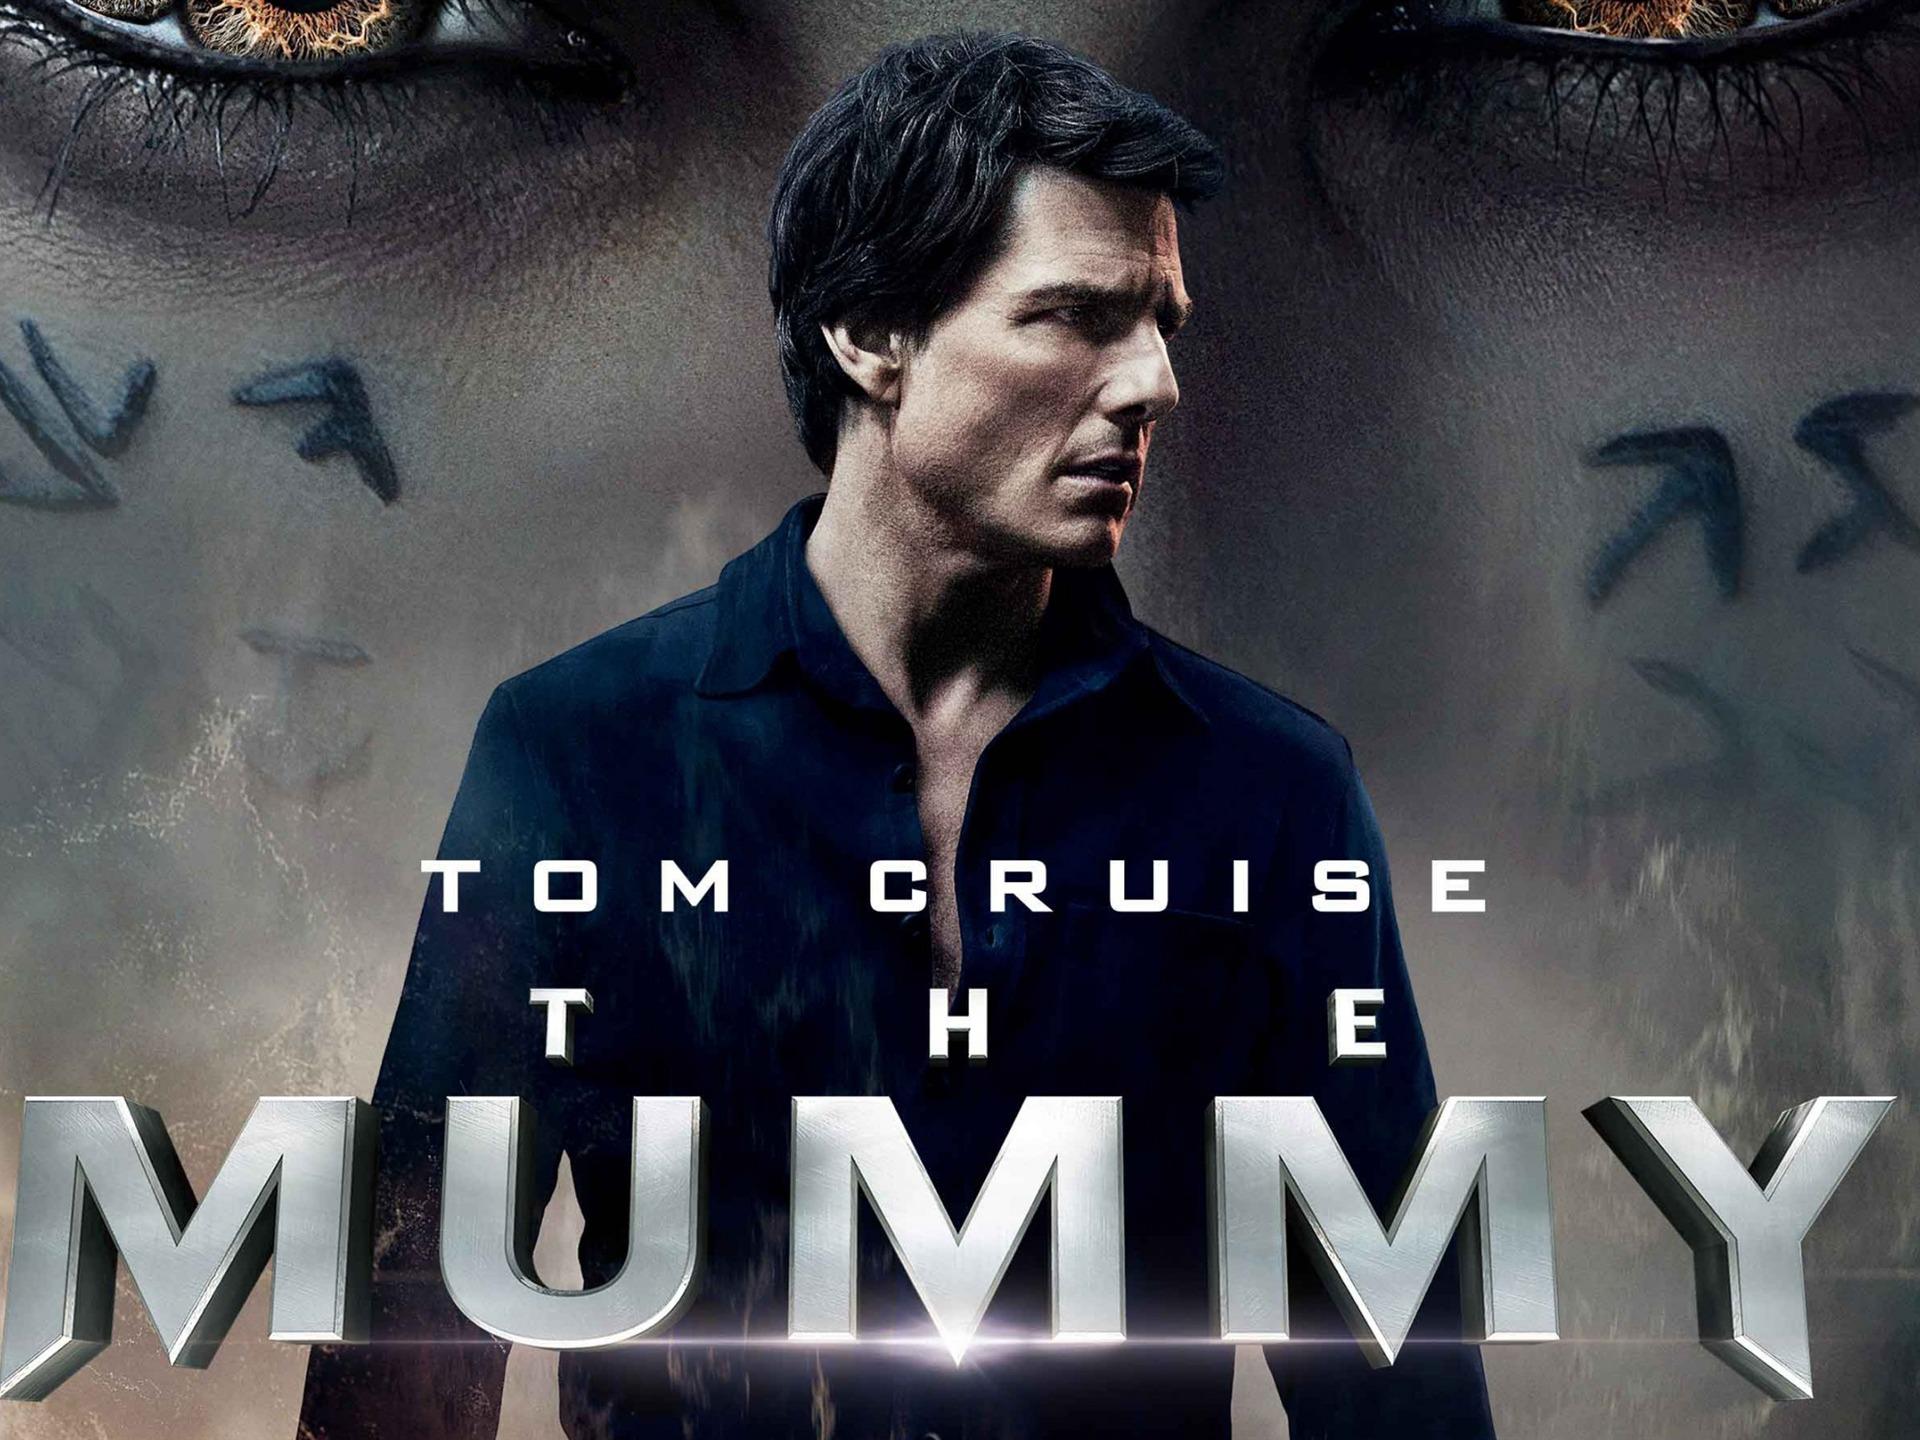 Wallpaper The Mummy 2017 Movies Hd Movies 4142: 木乃伊 The Mummy 汤姆·克鲁斯-2017电影高清壁纸预览